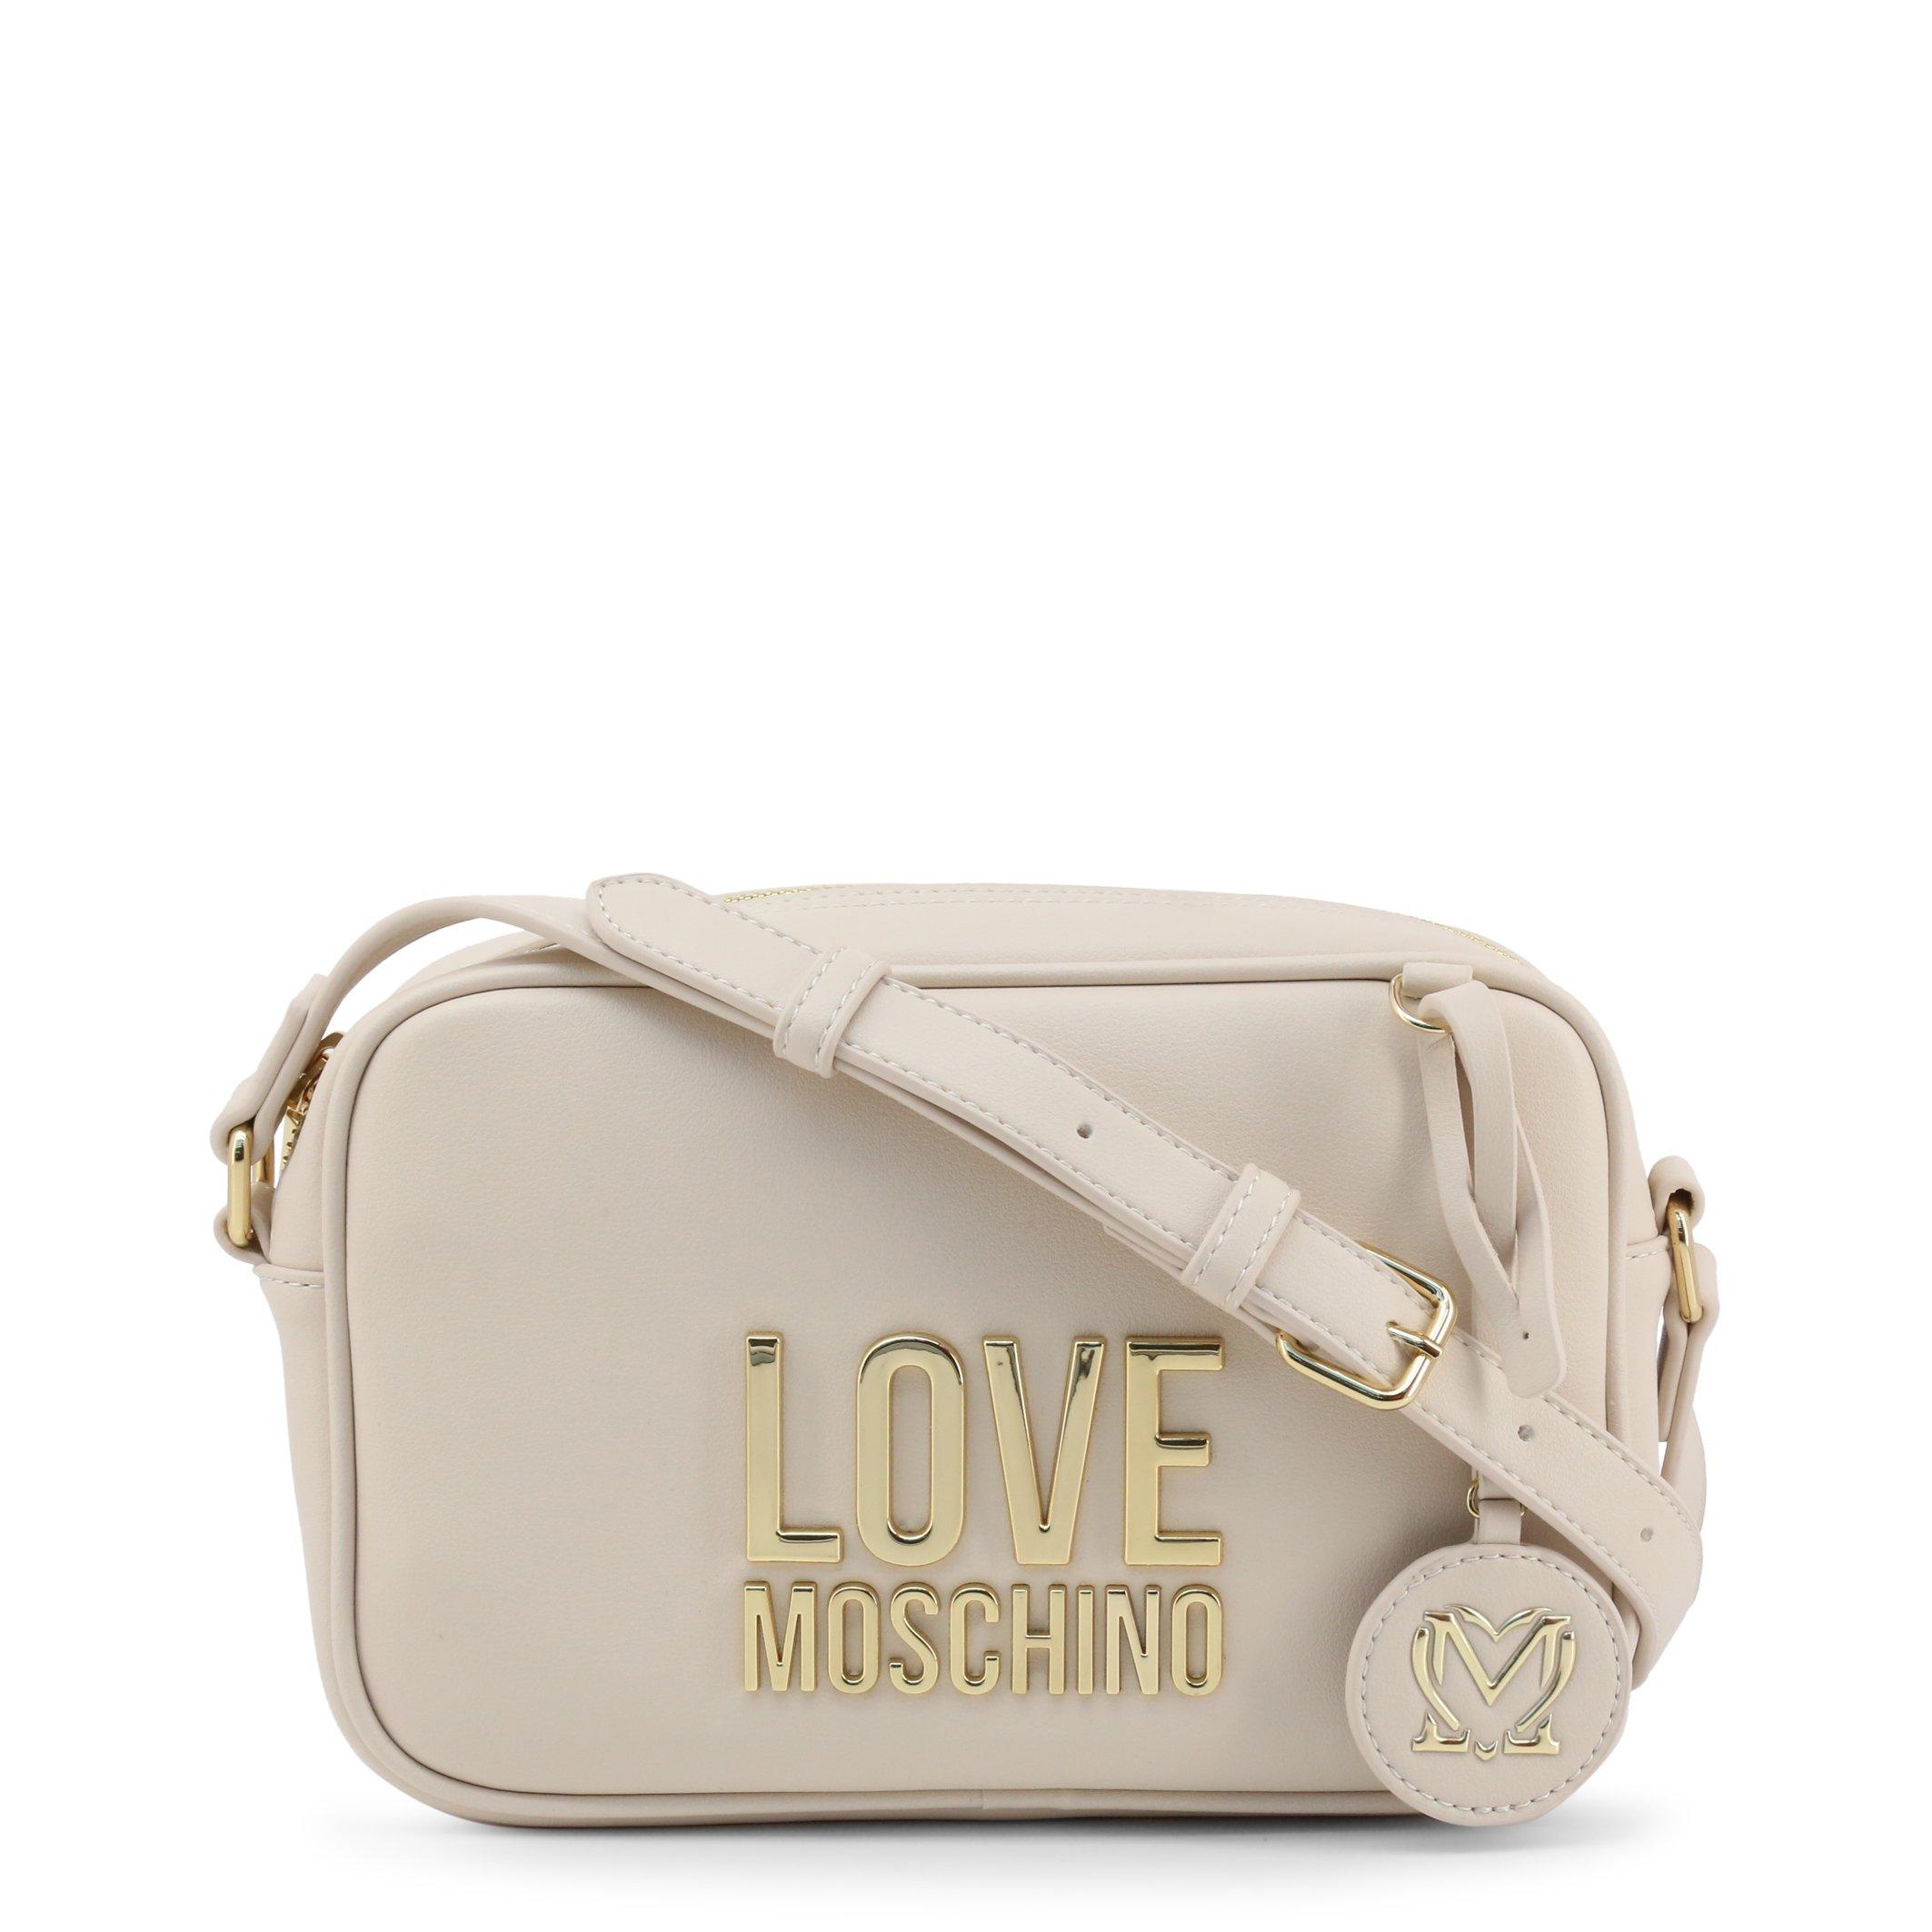 Love Moschino Women's Crossbody Bag Brown JC4107PP1CLJ0 - brown-1 NOSIZE